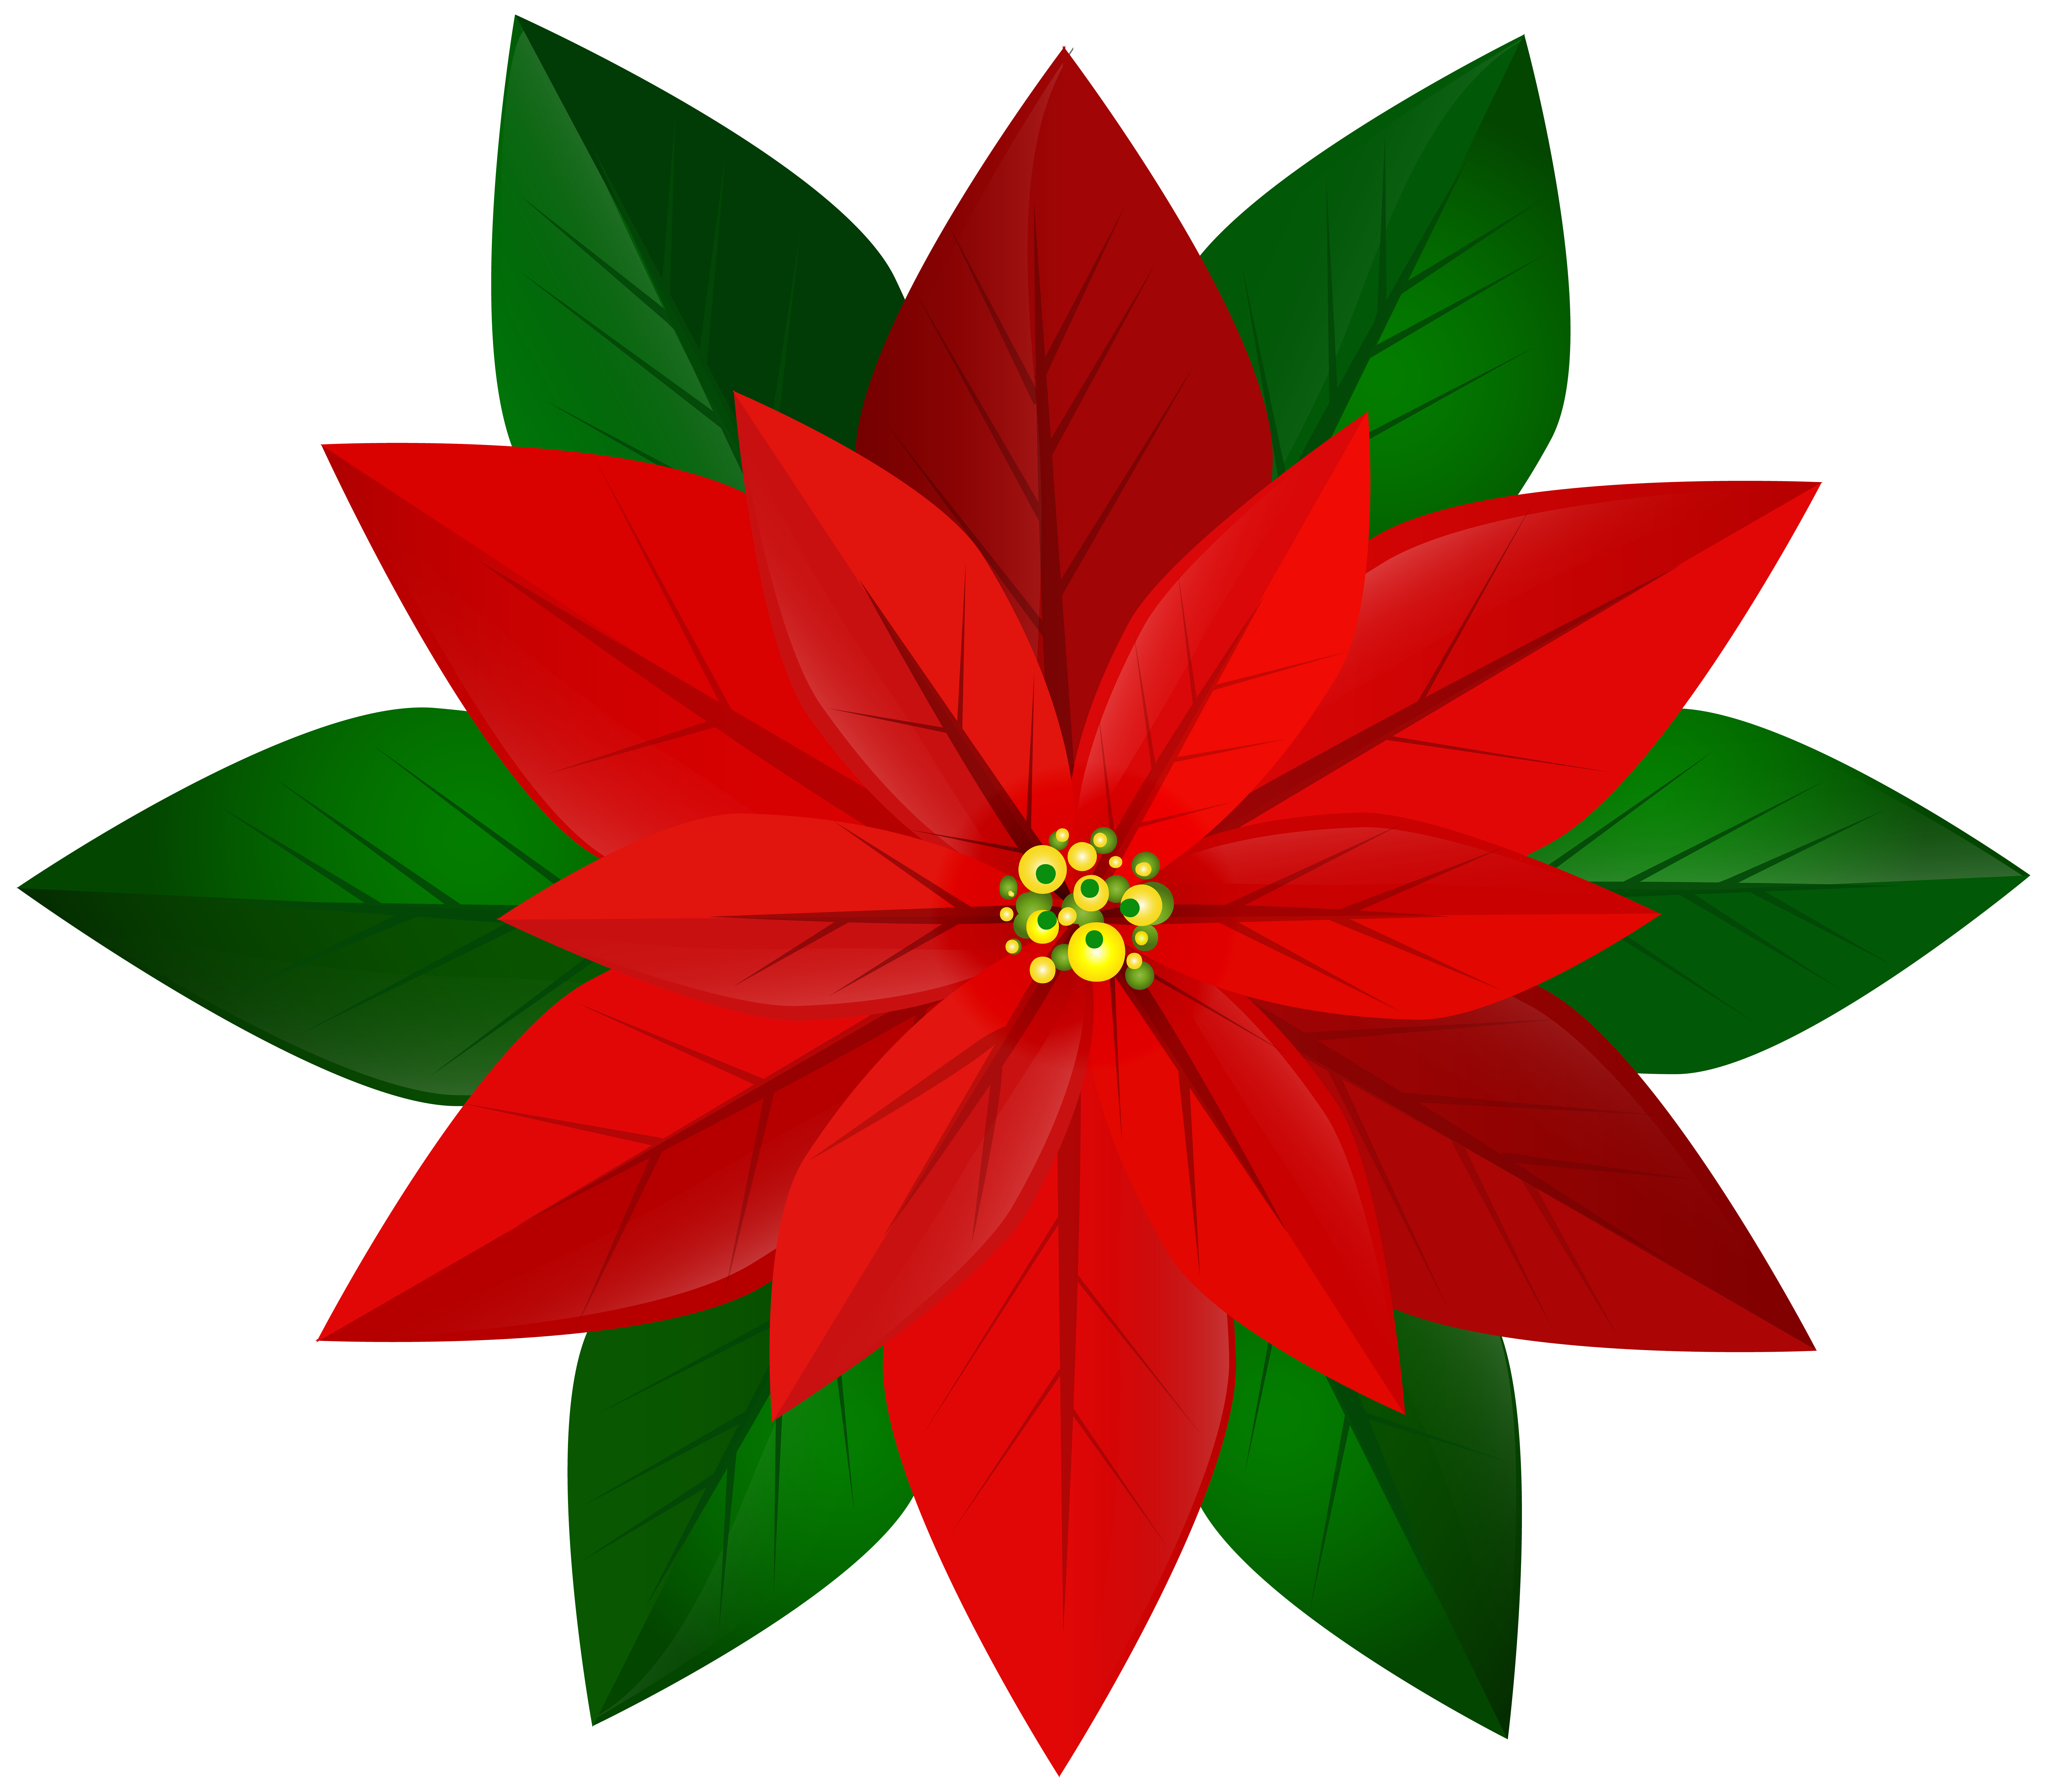 8000x7003 Christmas Red Poinsettia Png Clip Art Imageu200b Gallery